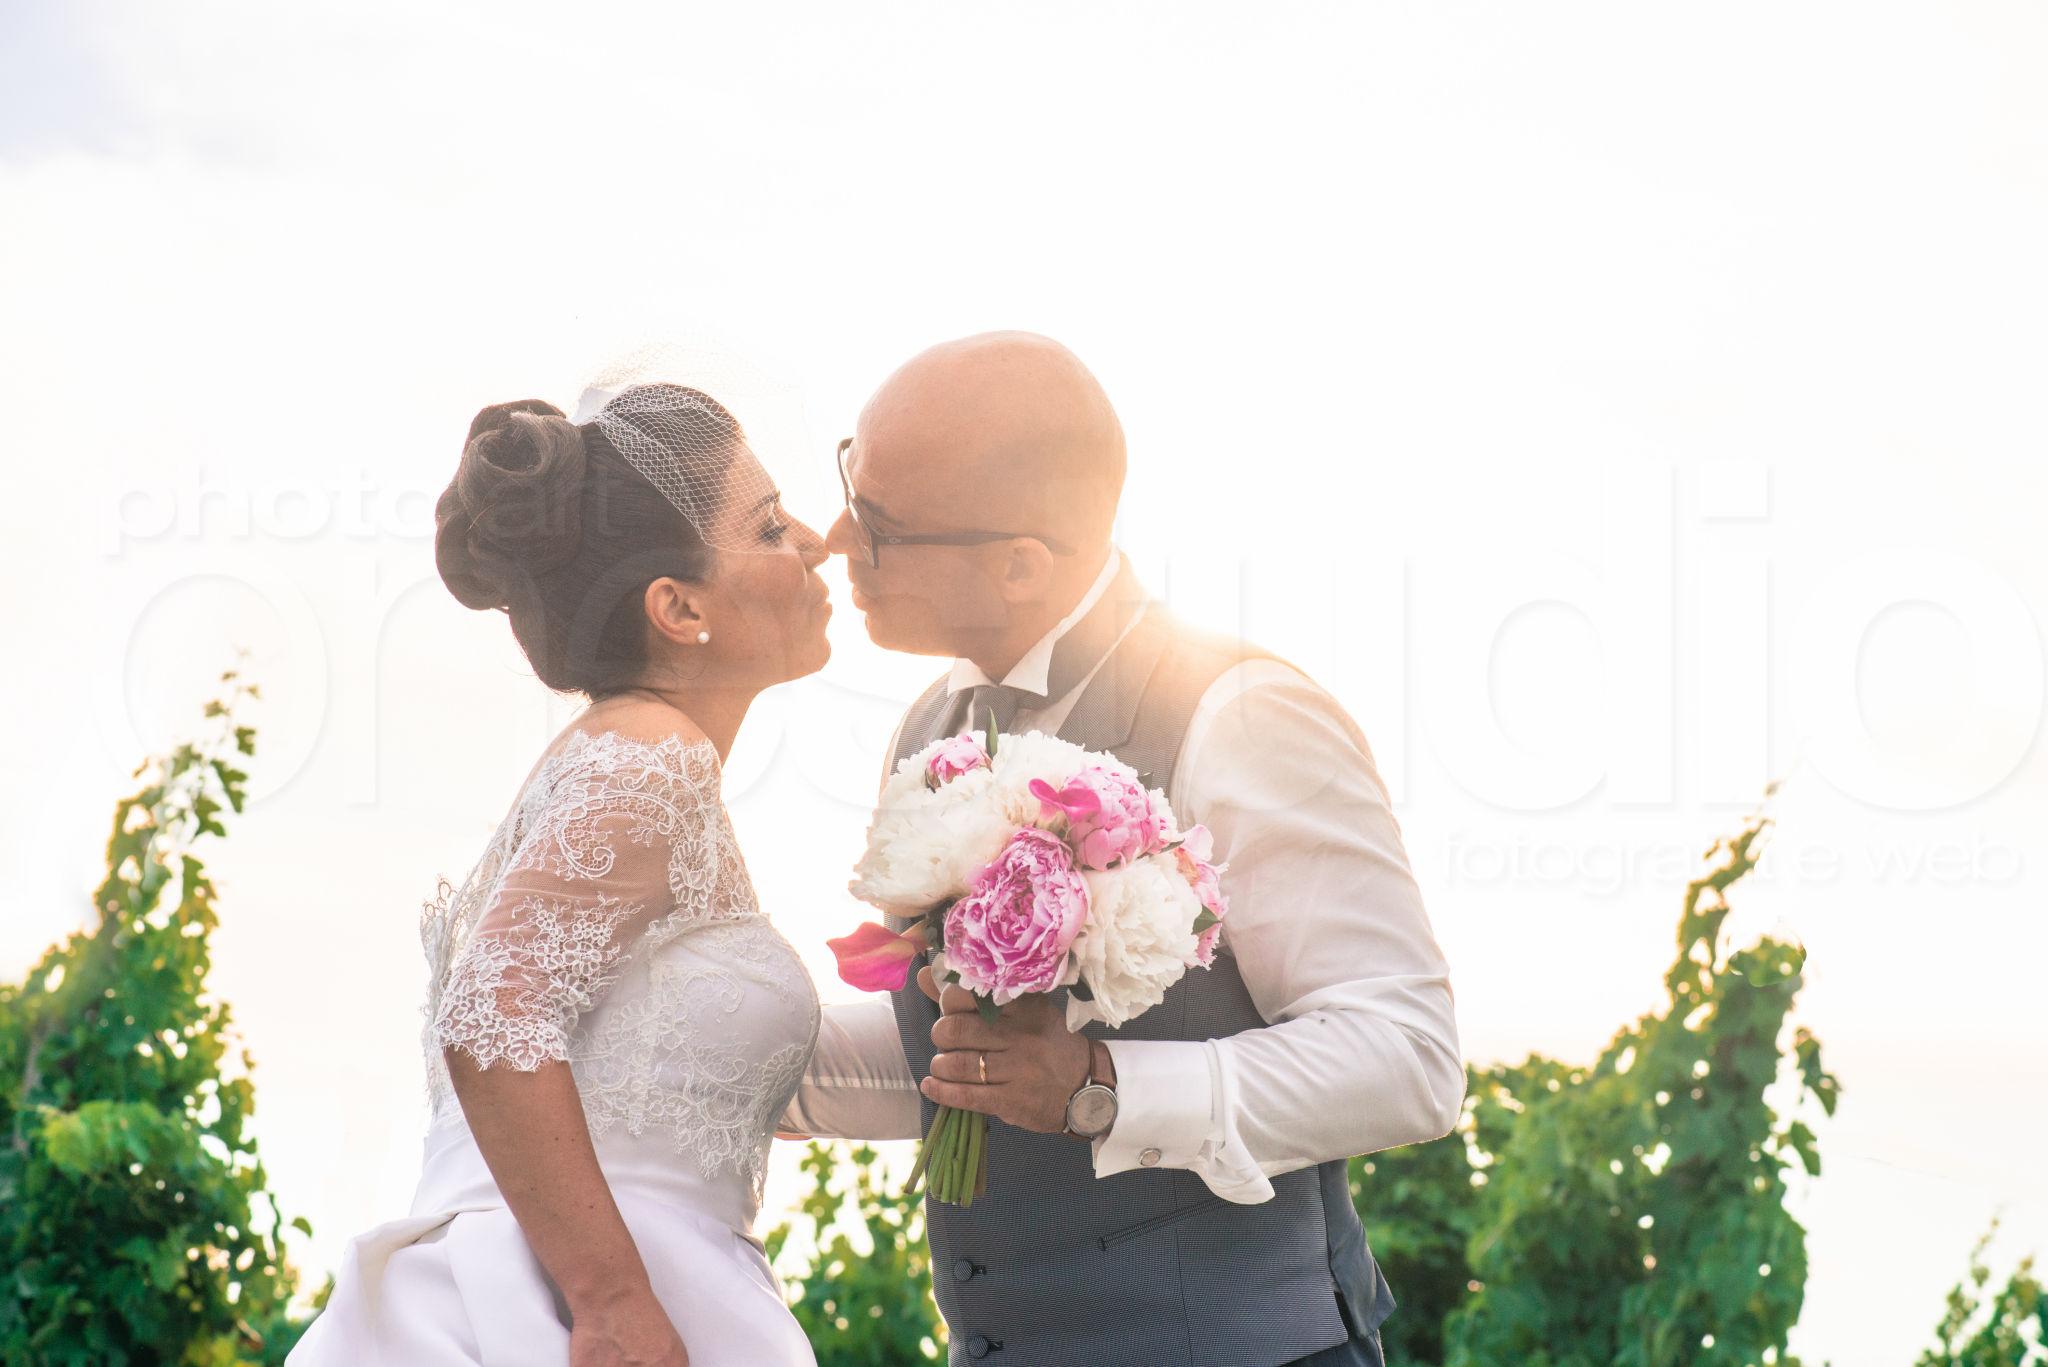 https://lnx.mirkone.it/wp-content/uploads/2015/07/fotografo-matrimoni-faenza-0009.jpg